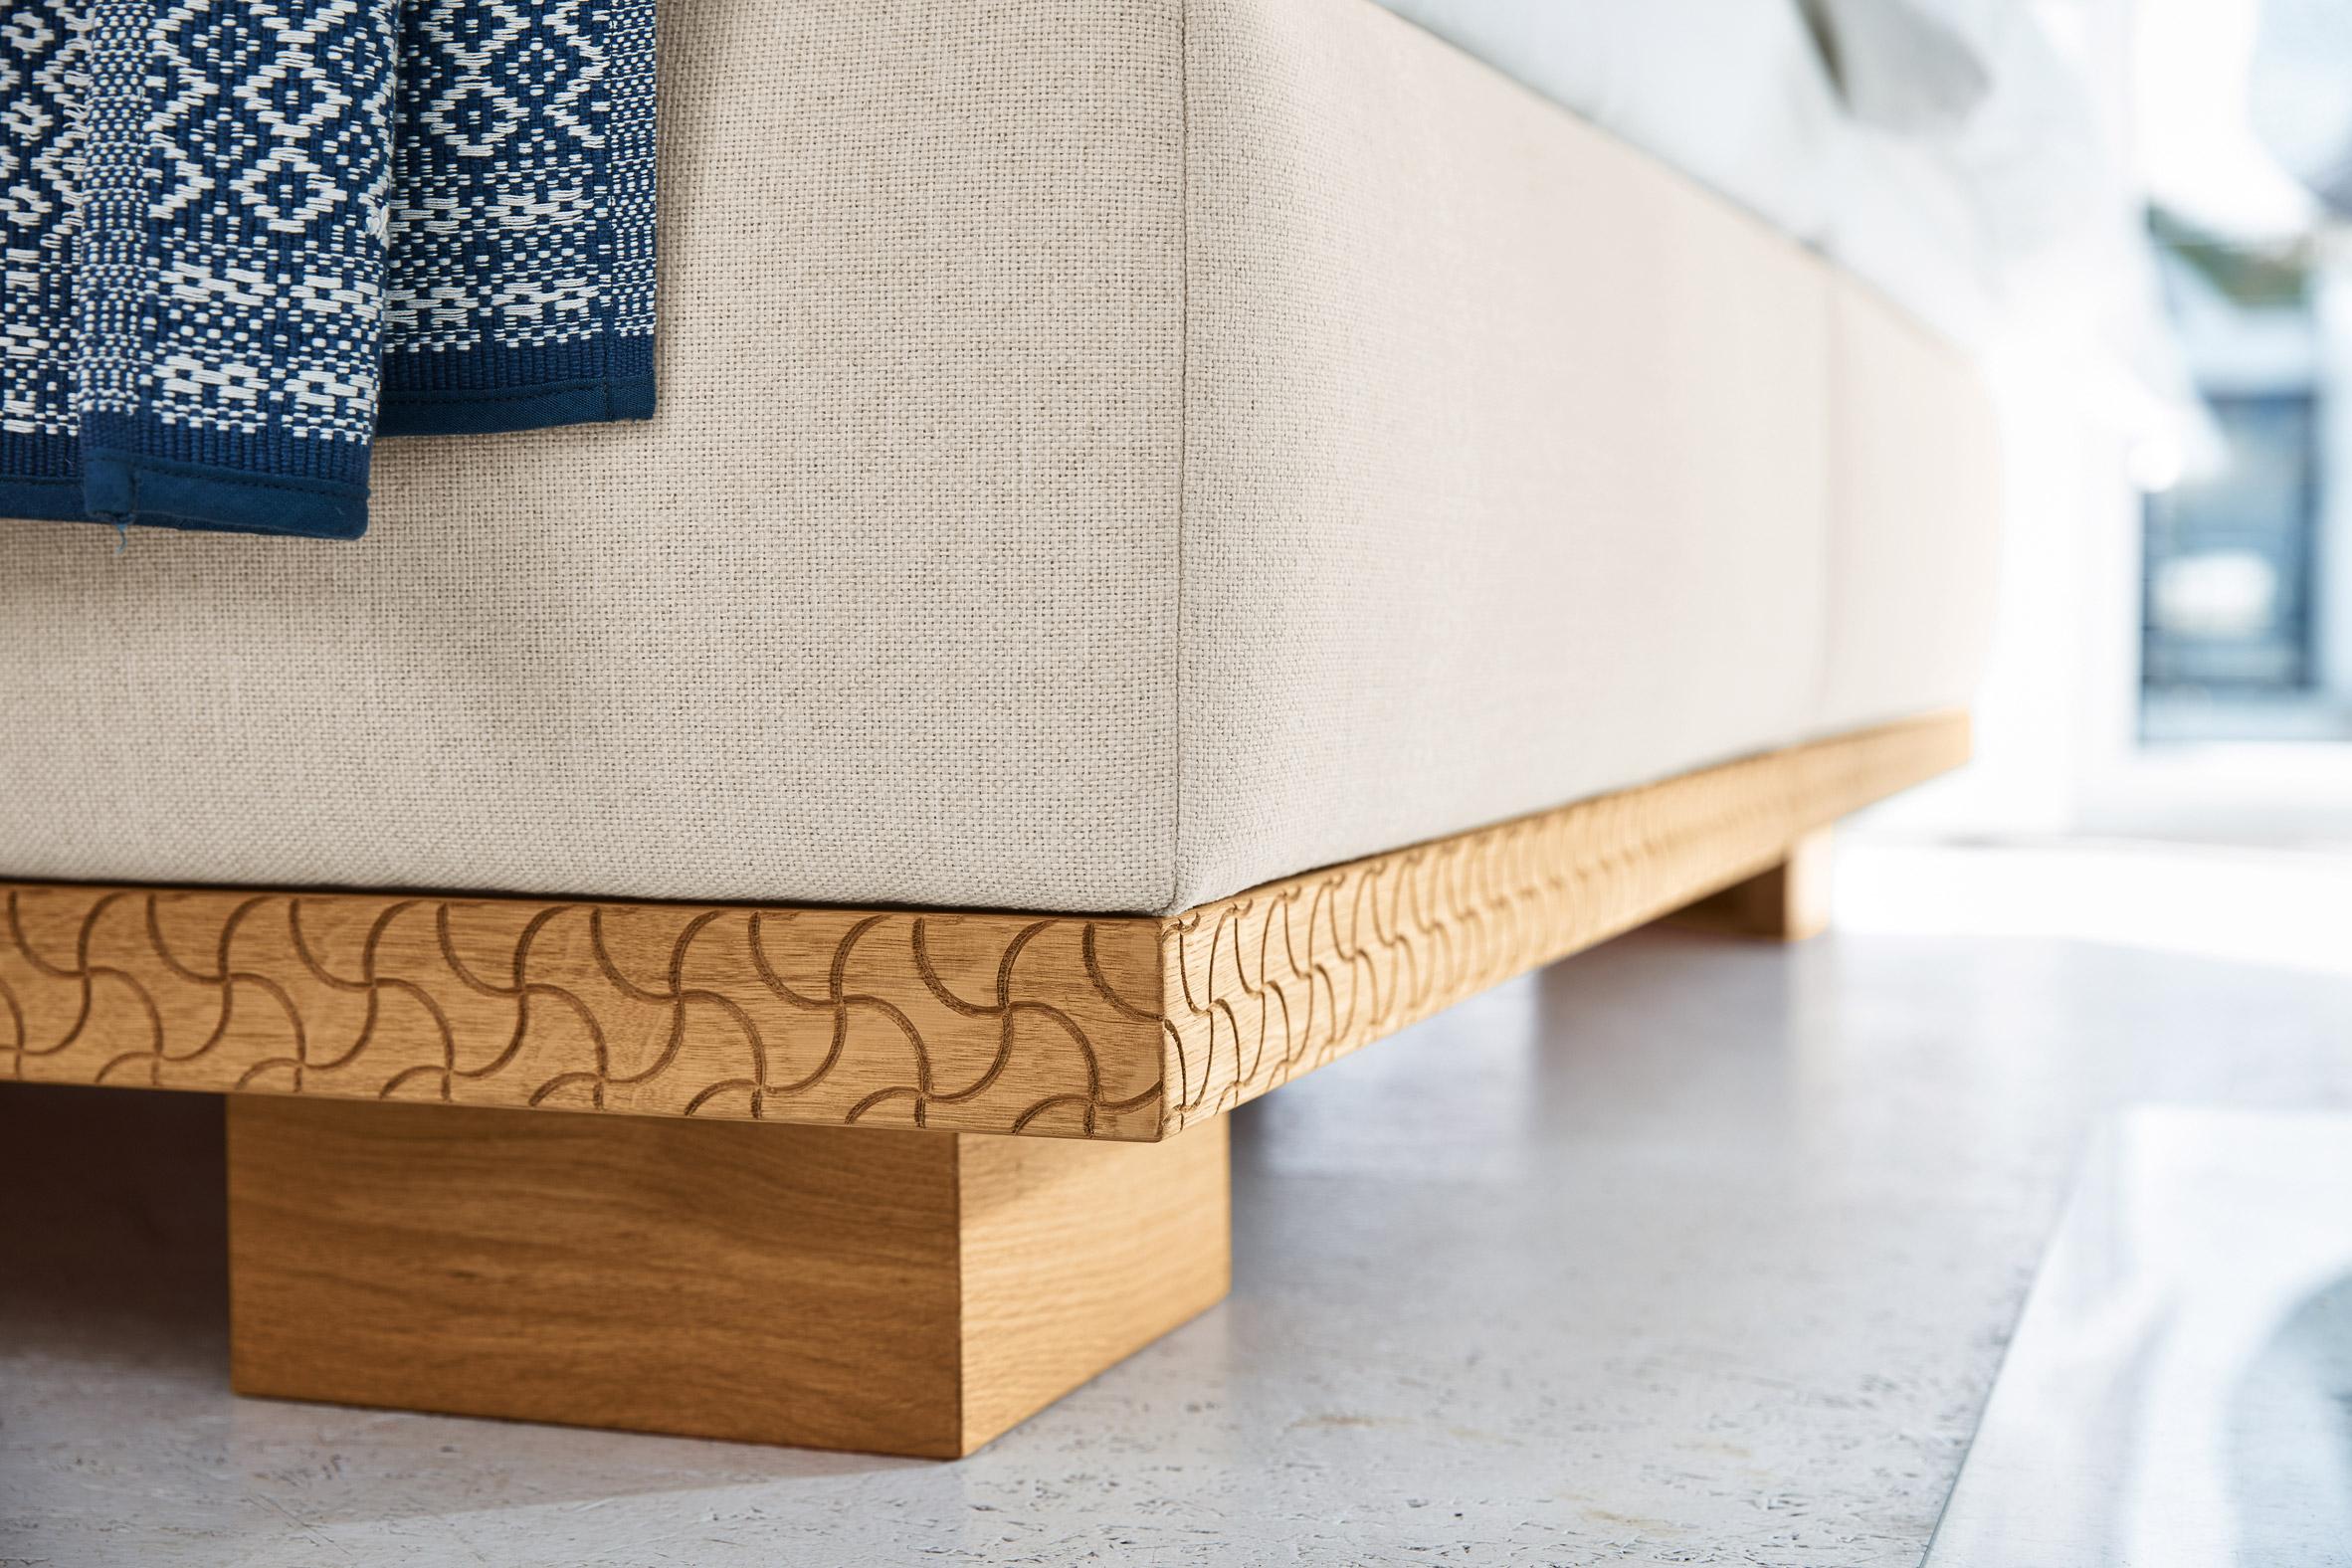 imm-cologne-2017-design-furniture-beds-birkenstock_dezeen_2364_col_21